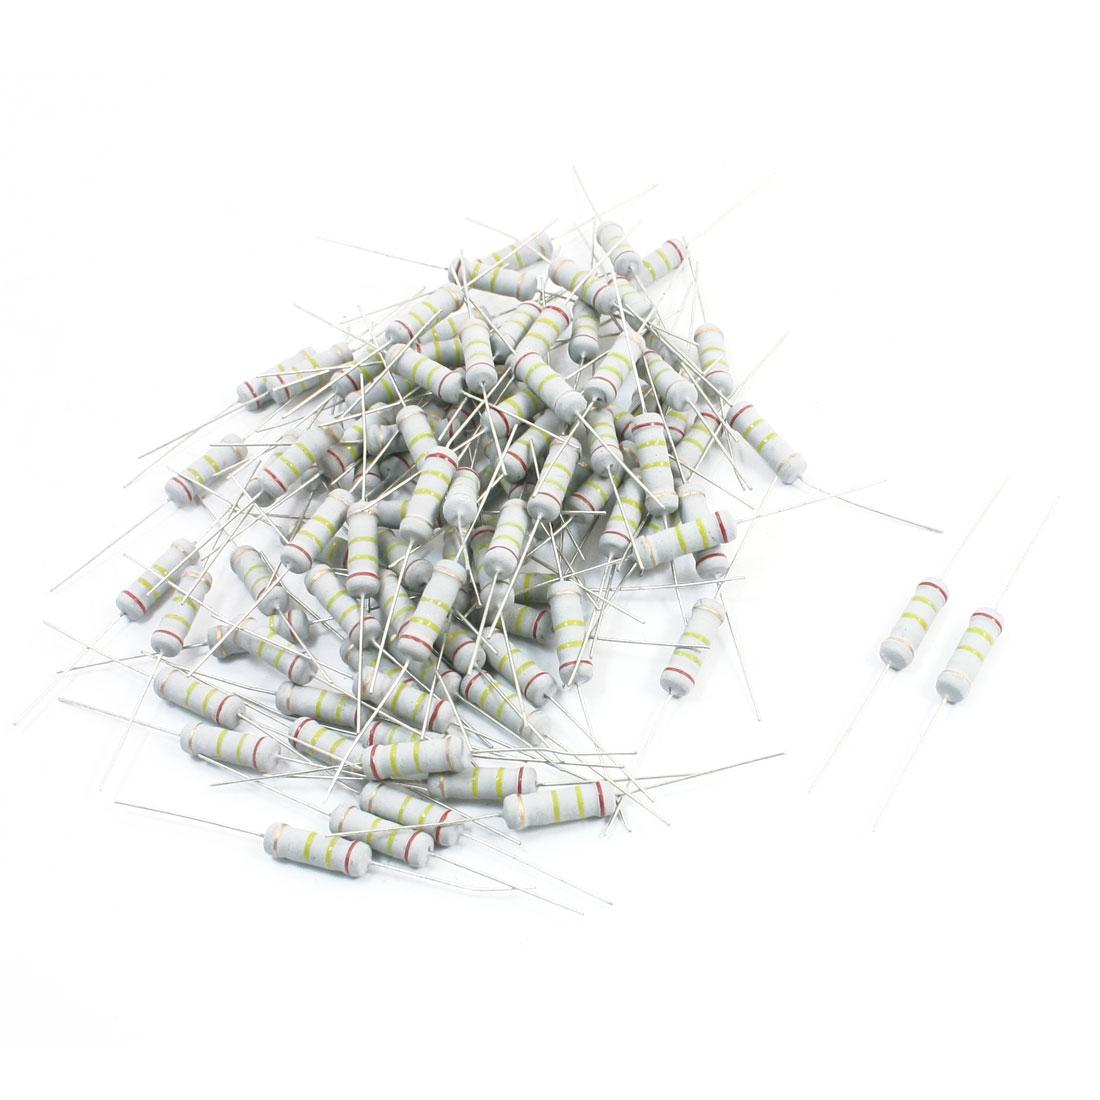 100Pcs 240K Ohm 2W 5% Axial Leads Metal Oxide Film Resistor Resistance